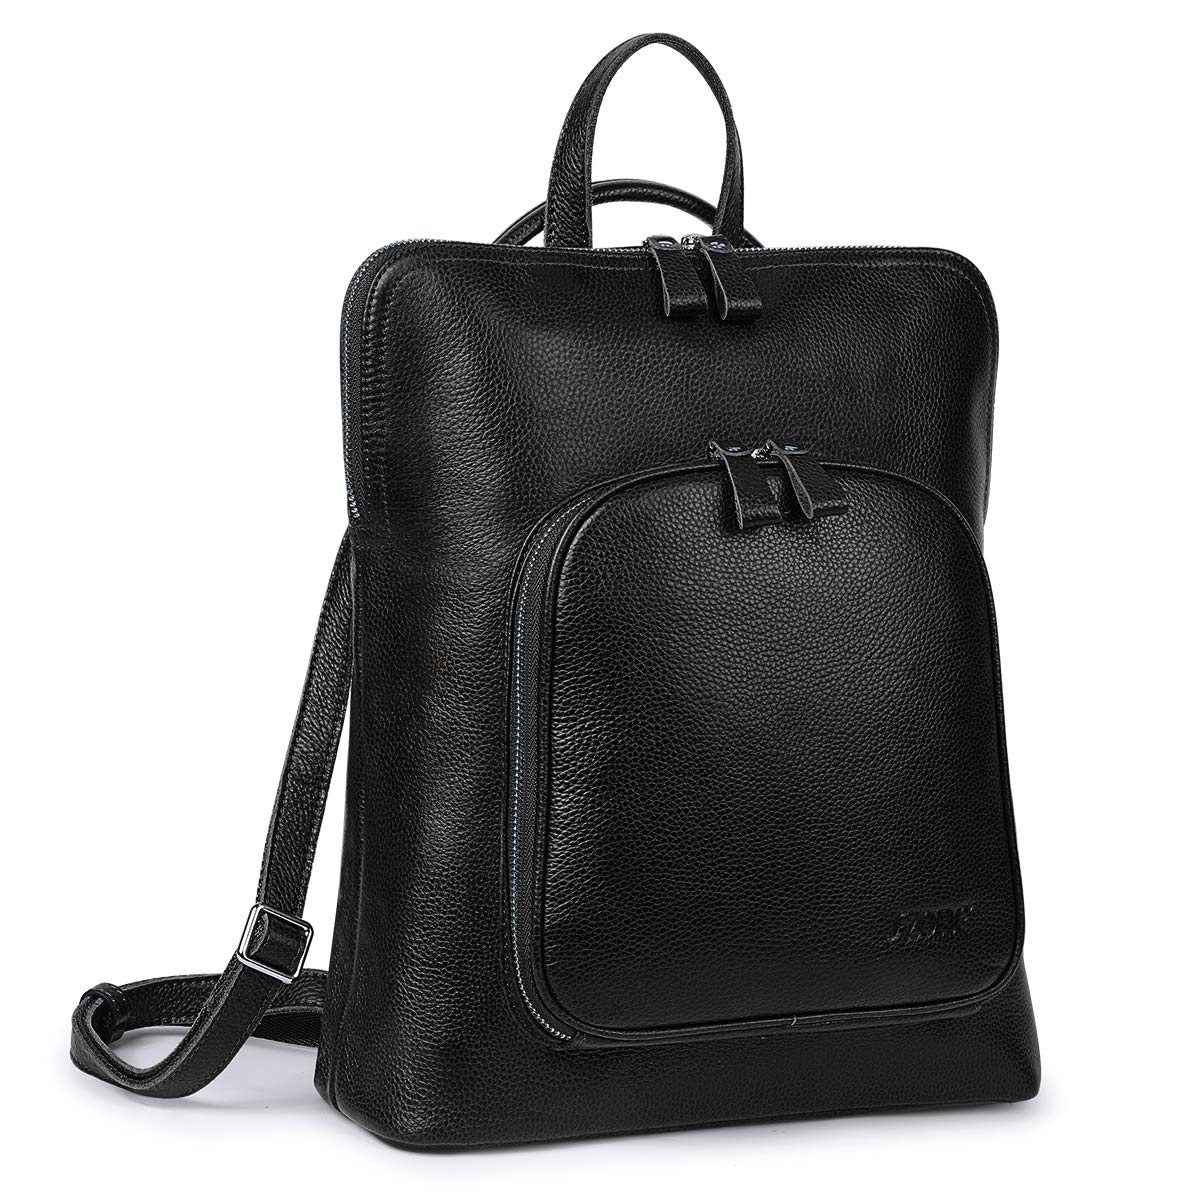 S-ZONE Women Soft Leather Backpack Travel Daypack Shoulder Bag